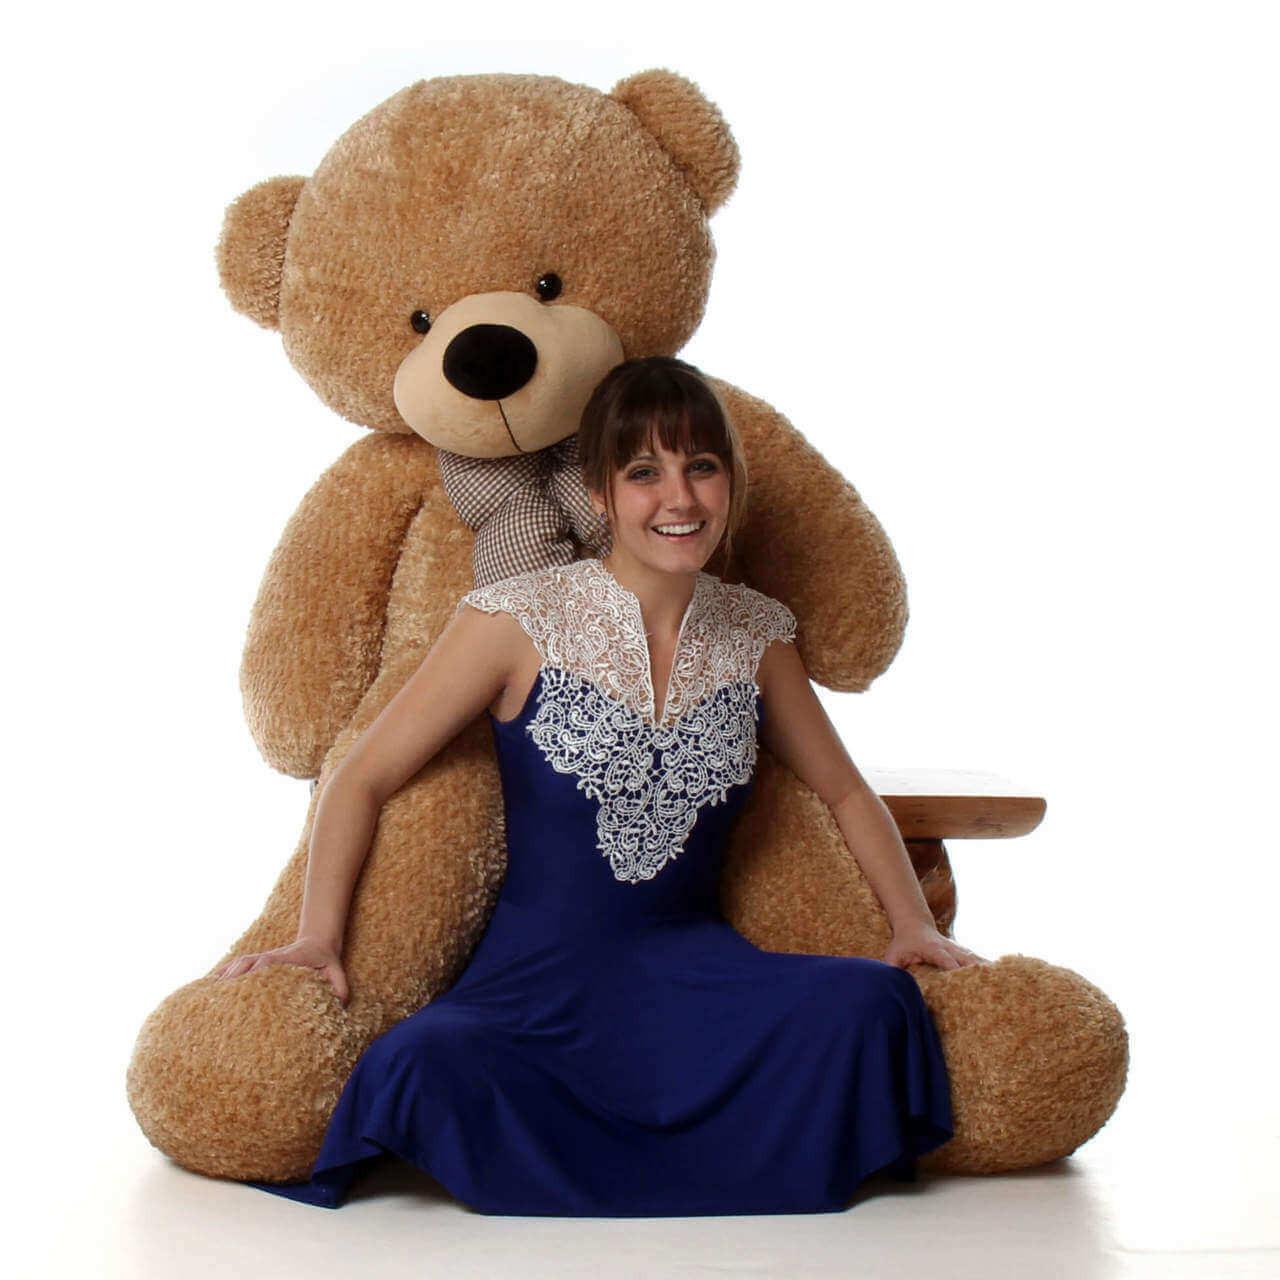 5ft Life Size Teddy Bear Shaggy Cuddles soft amber brown fur